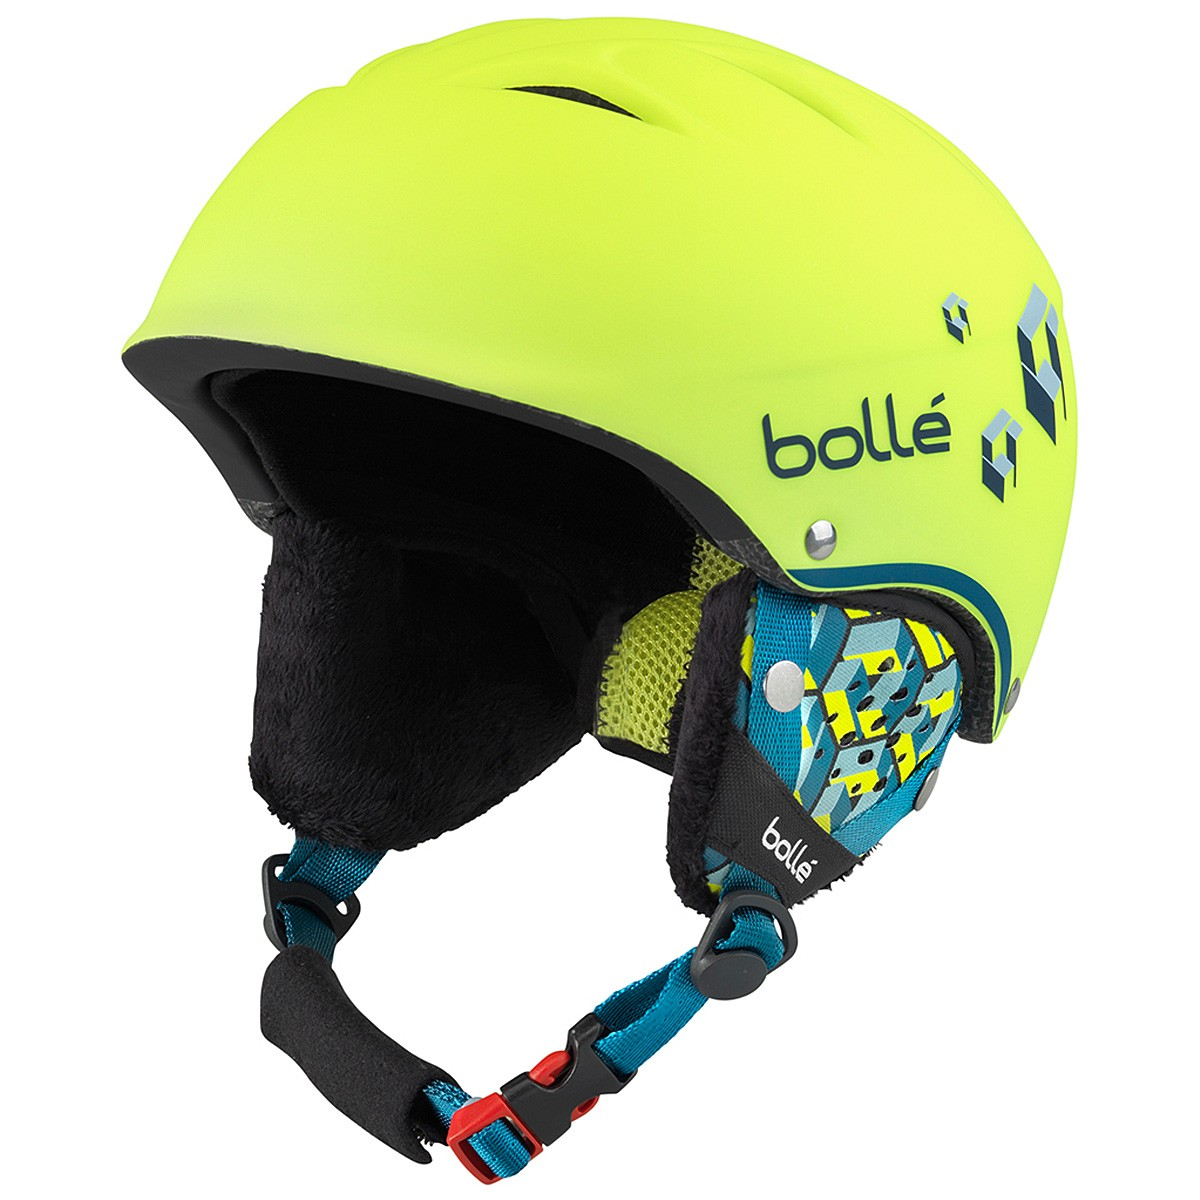 casque ski bolle b free junior casques ski et snowboard. Black Bedroom Furniture Sets. Home Design Ideas